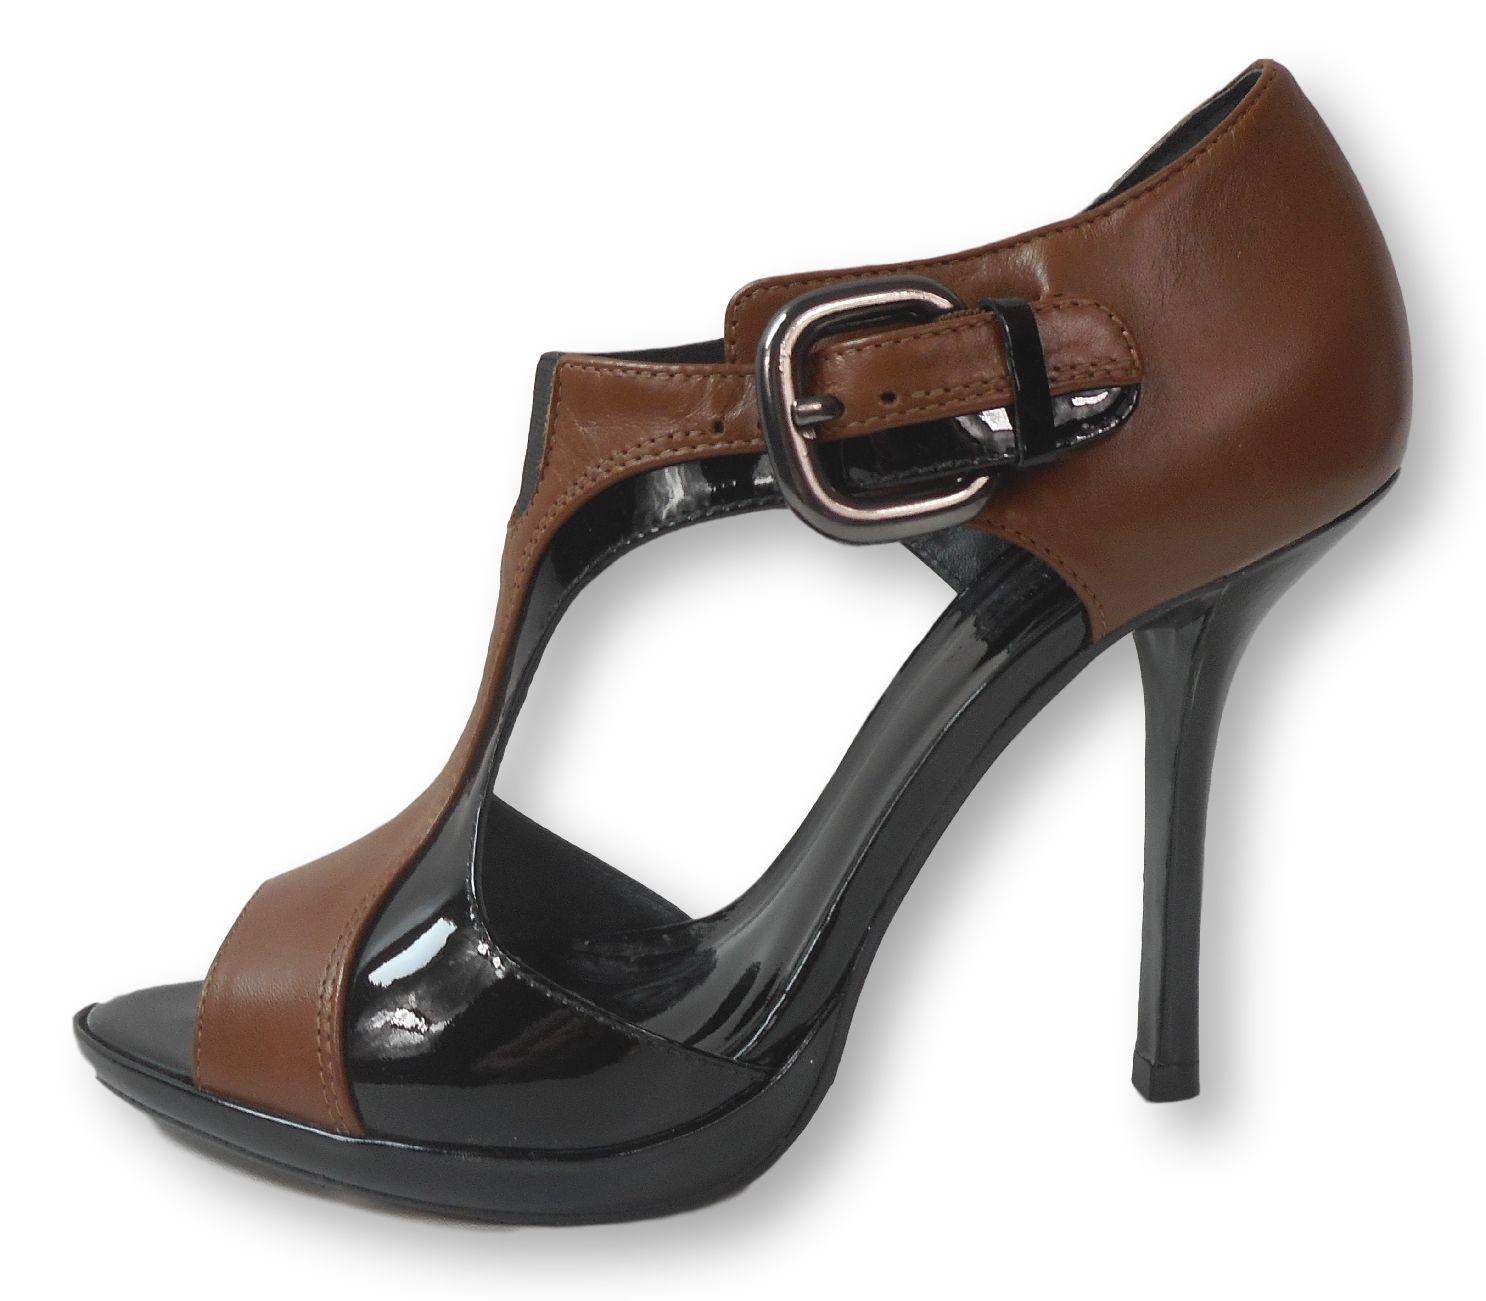 KAREN MILLEN Patent & Leatehr Heel UK6 Clothes design